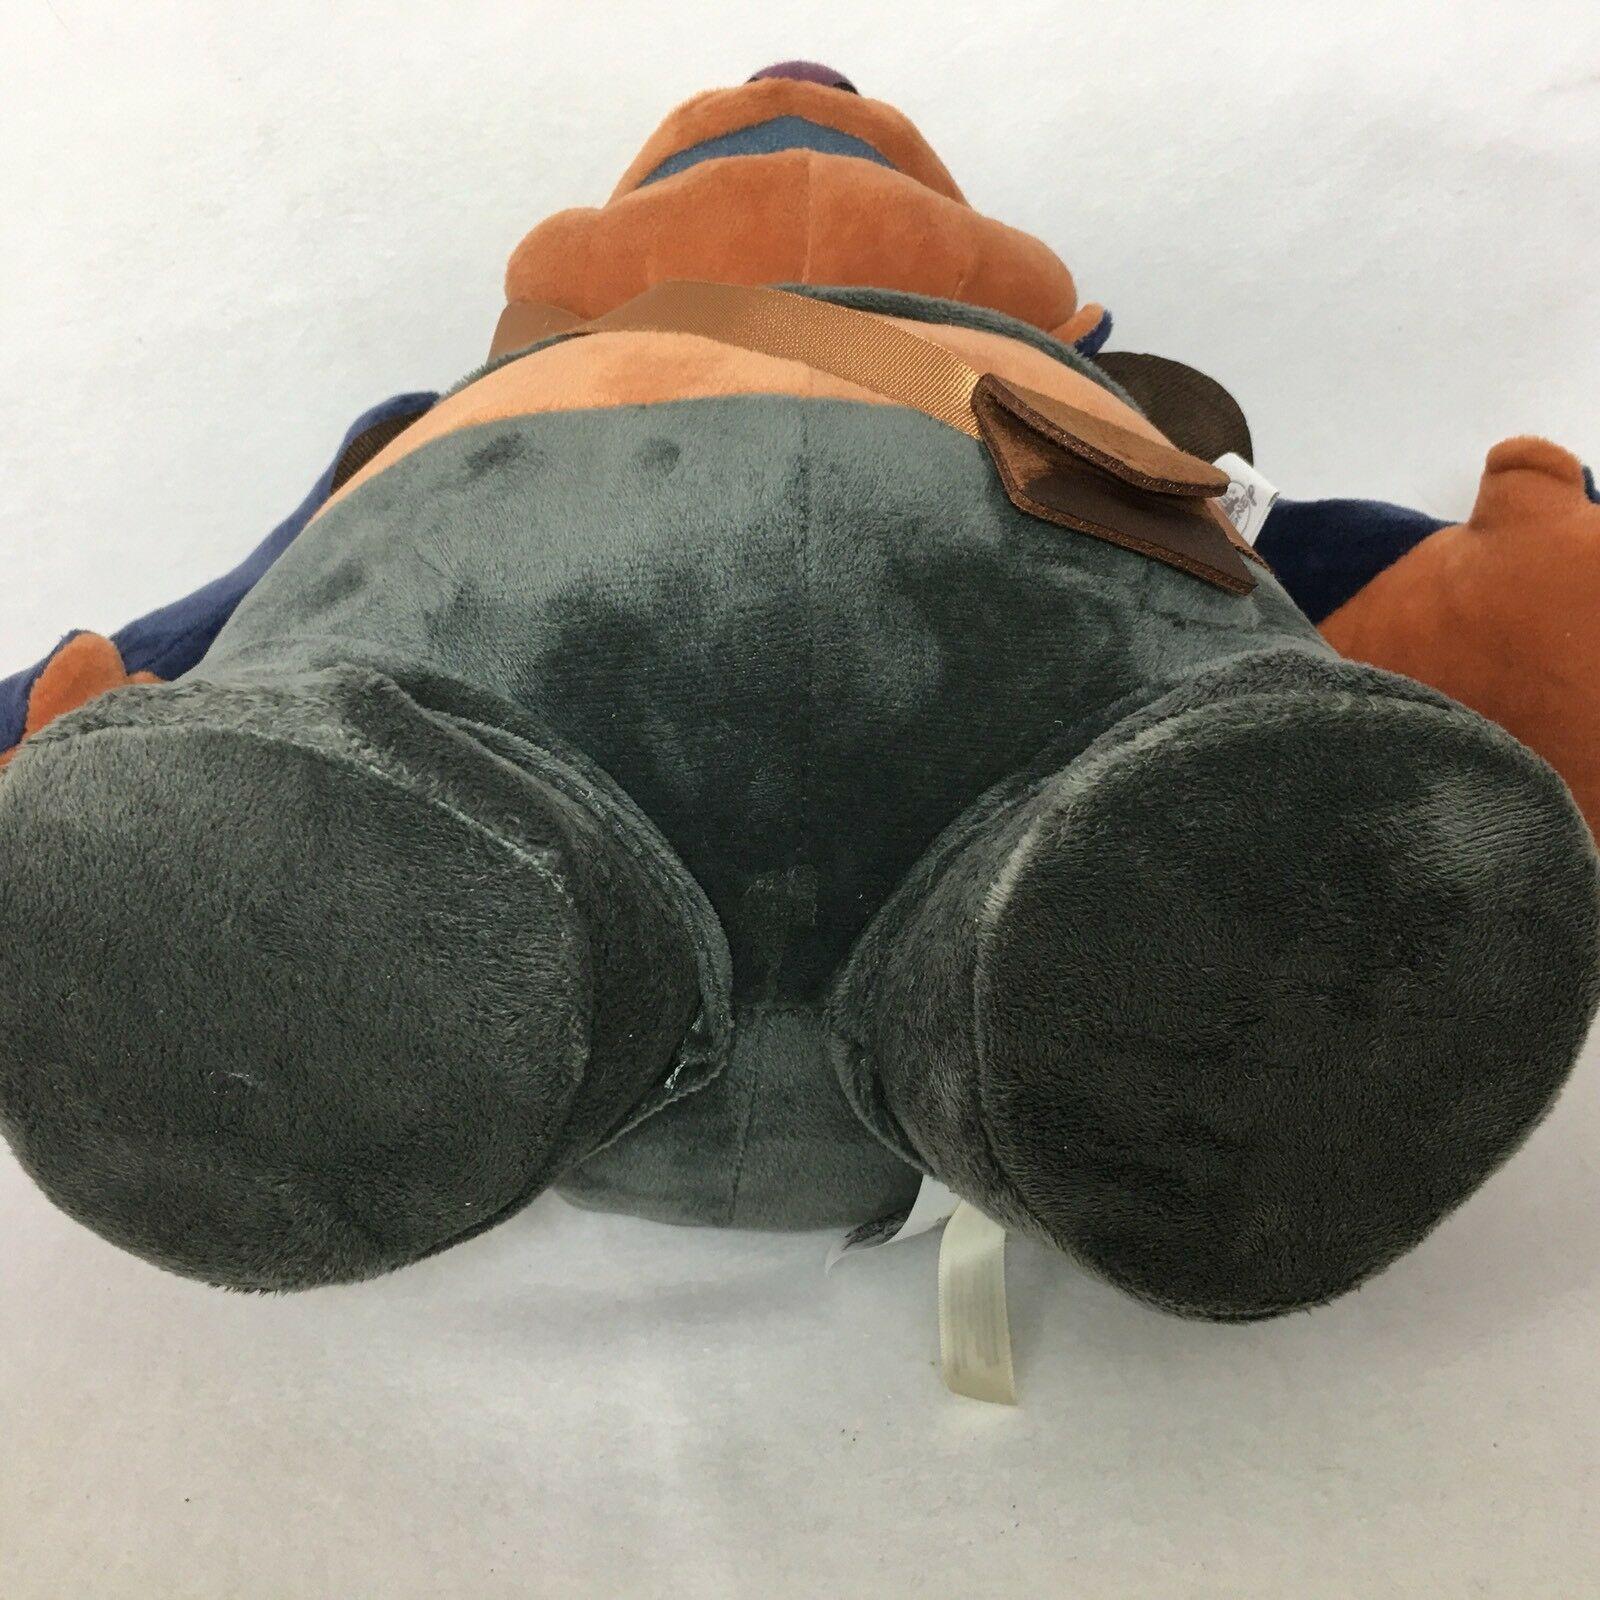 Disney Store Dr Jumba Jookiba Plush From Lilo & Stitch 13 Inch Mad Scientist image 7